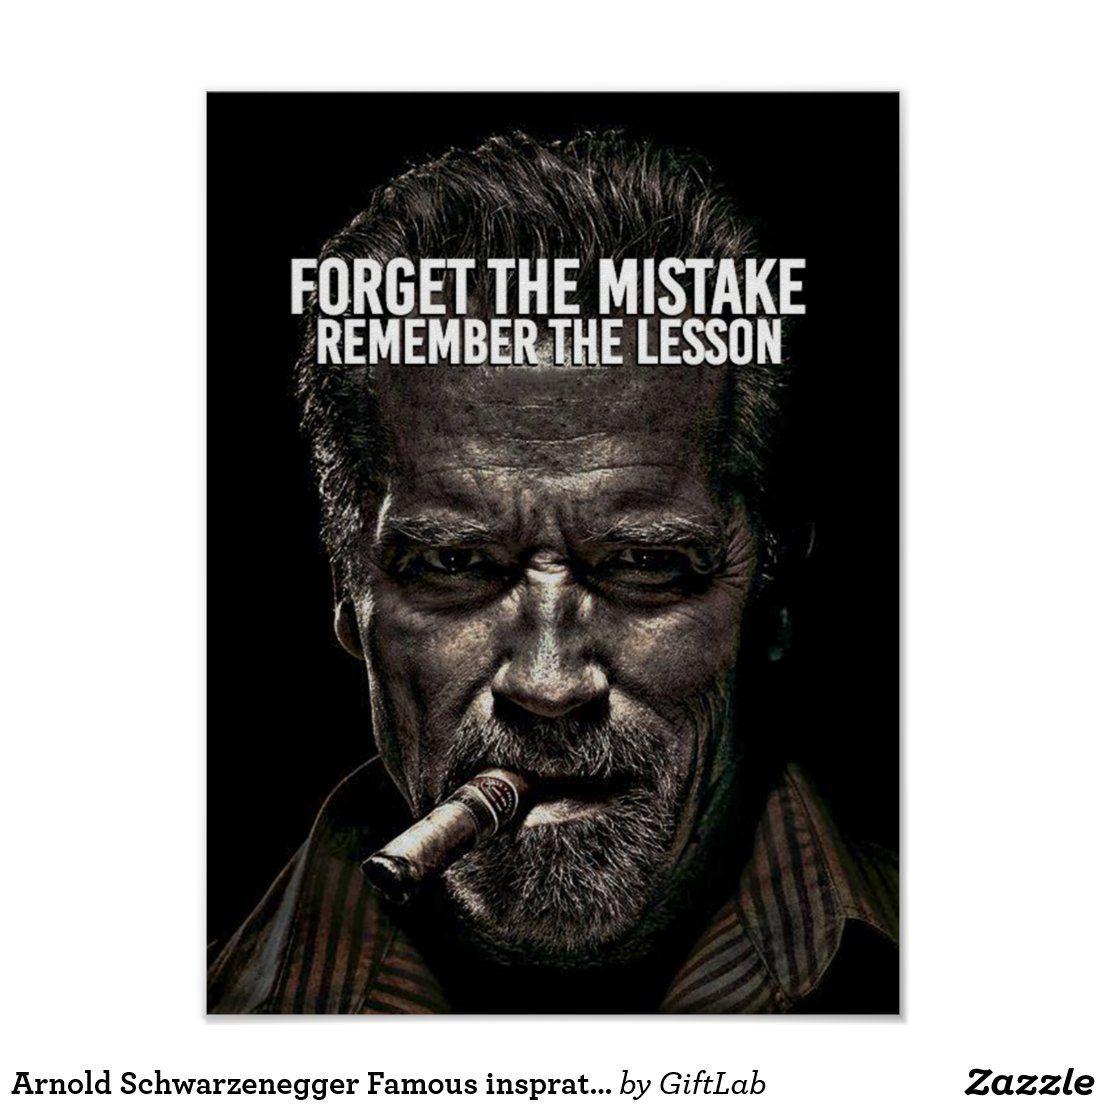 Arnold Schwarzenegger Famous insprational quote Poster | Zazzle.com